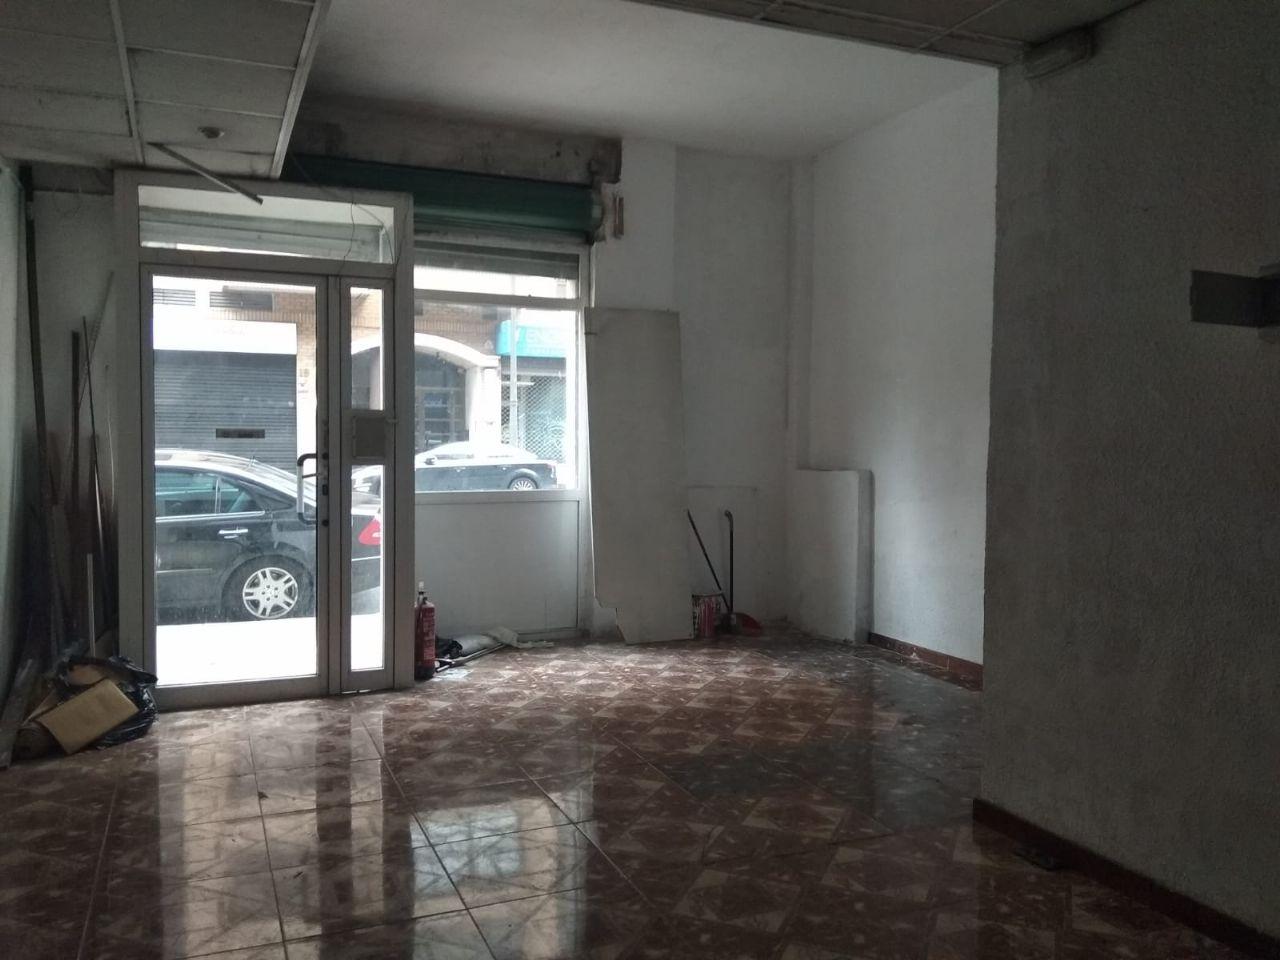 Local comercial en Valencia, L´OLIVERETA, alquiler